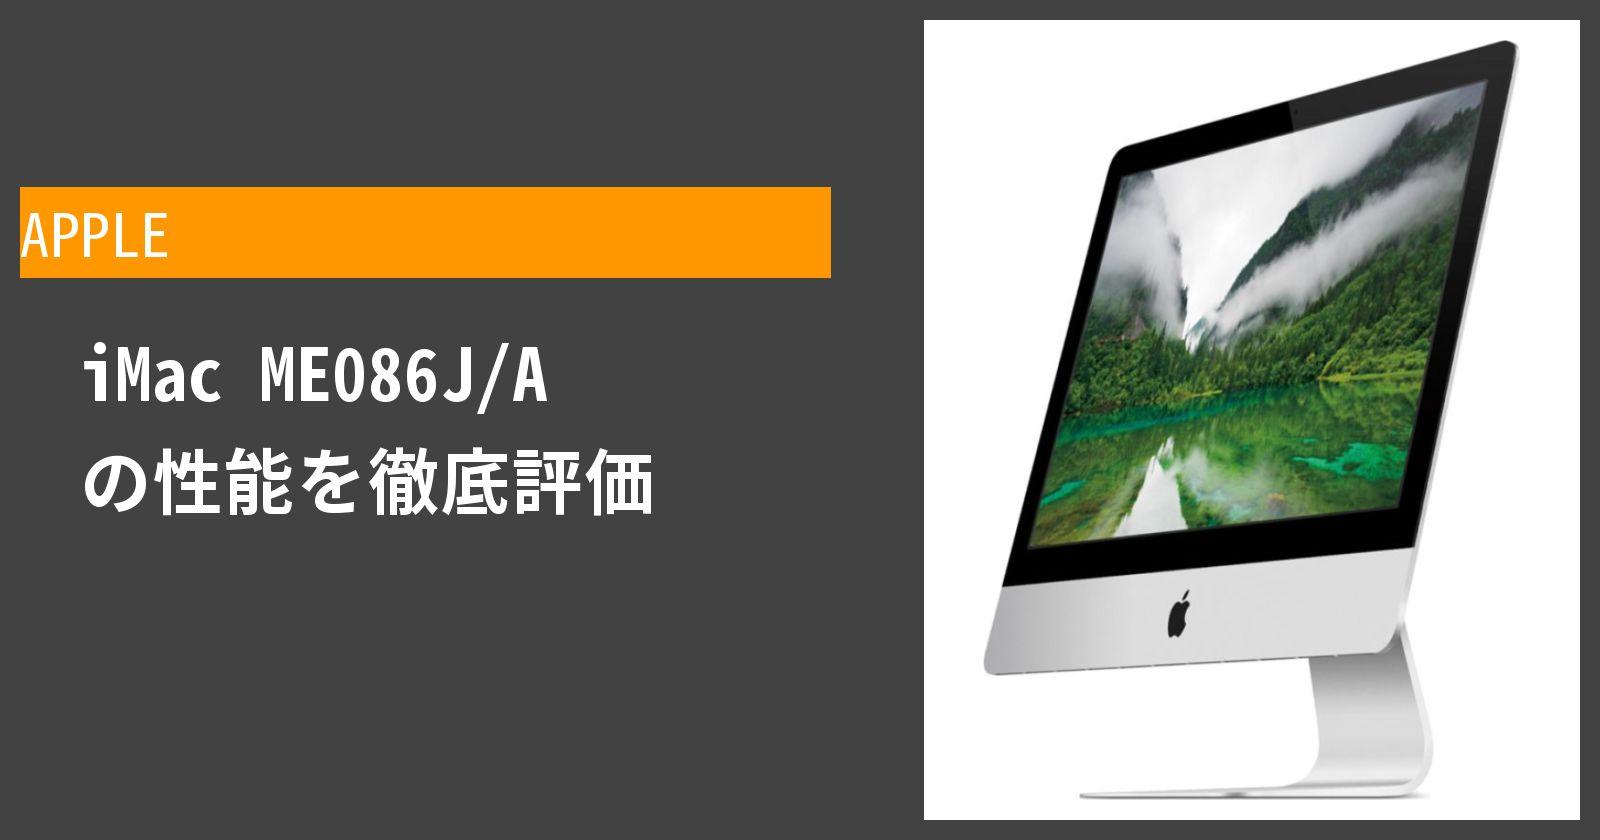 iMac ME086J/A の性能を徹底評価